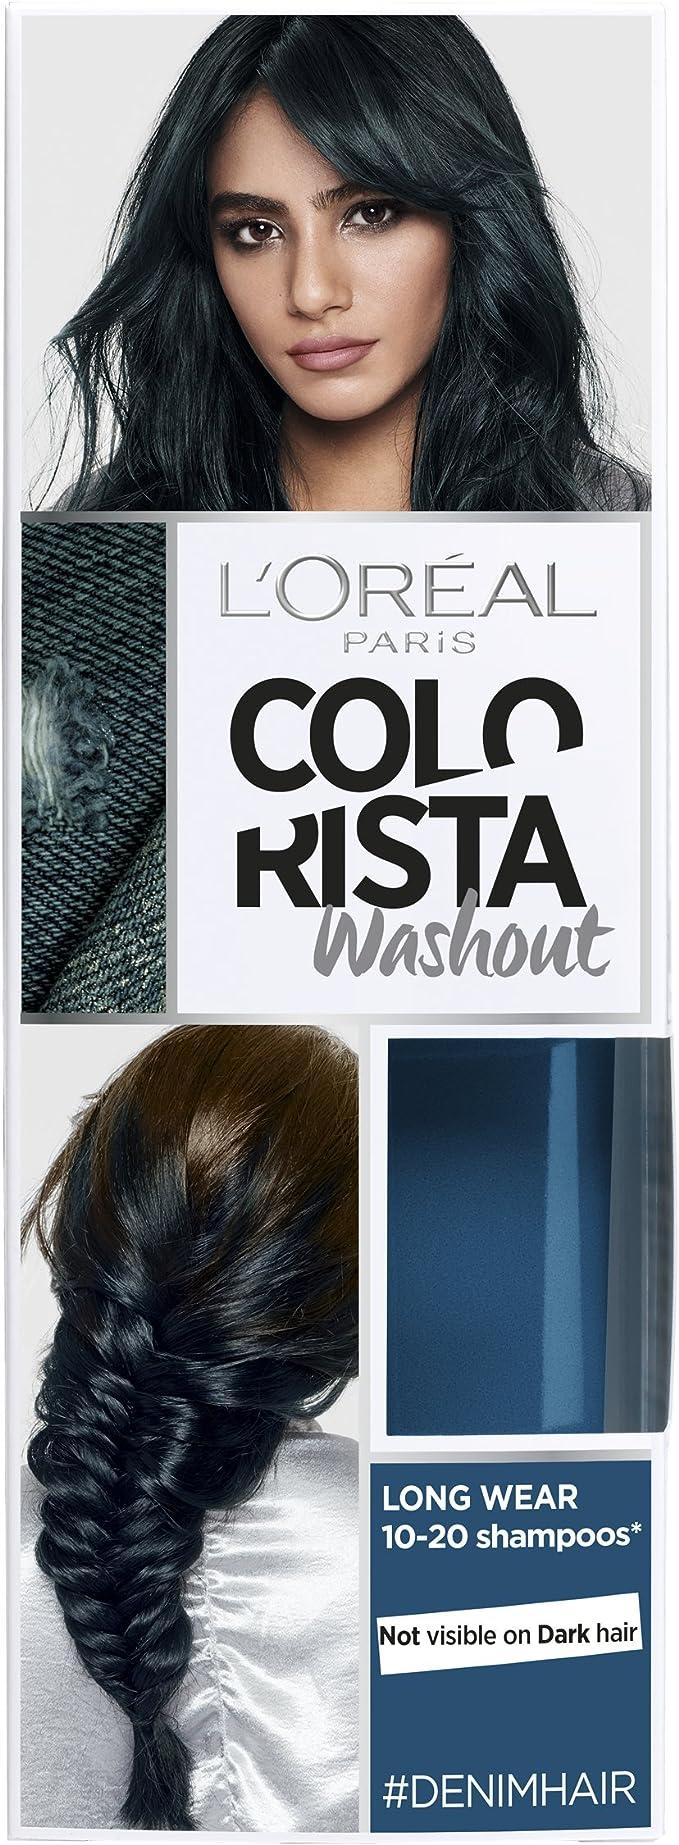 L Oreal colorista lavado Denim azul semipermanente pelo, 80 ml